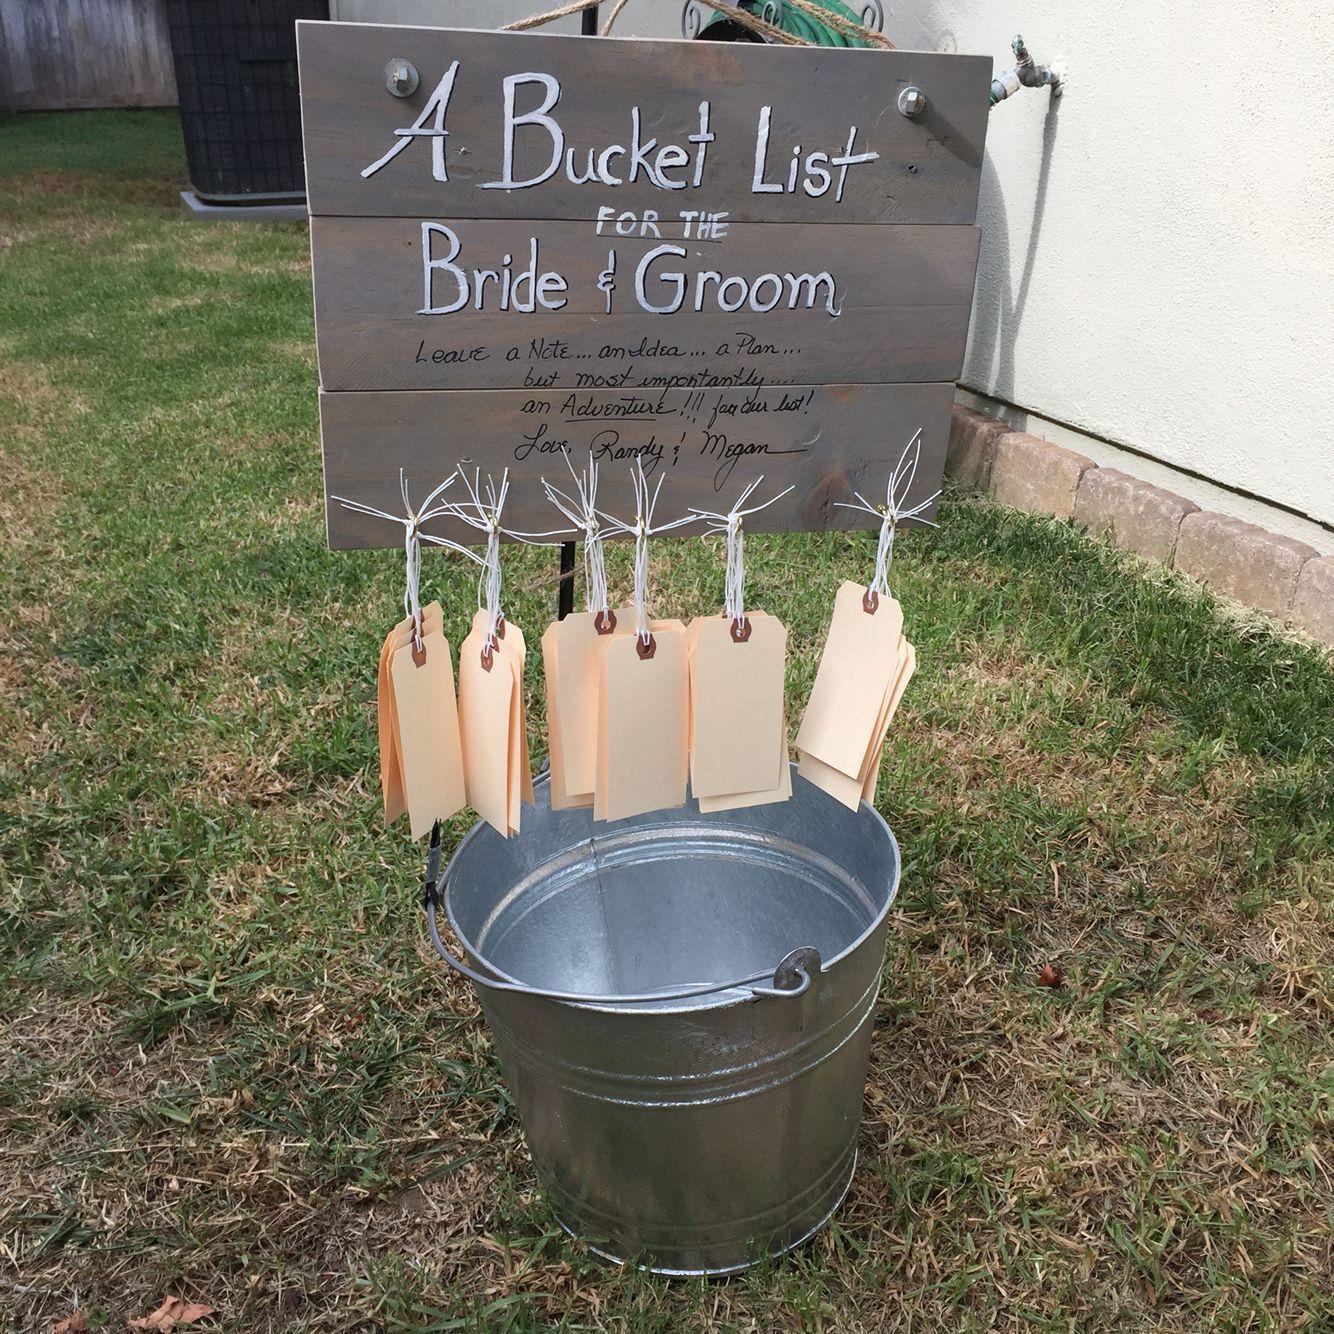 25 Rustikalen Land Hochzeits Ideen #decorationengagement 25 Rustikalen Land Hochzeits Ideen – Land